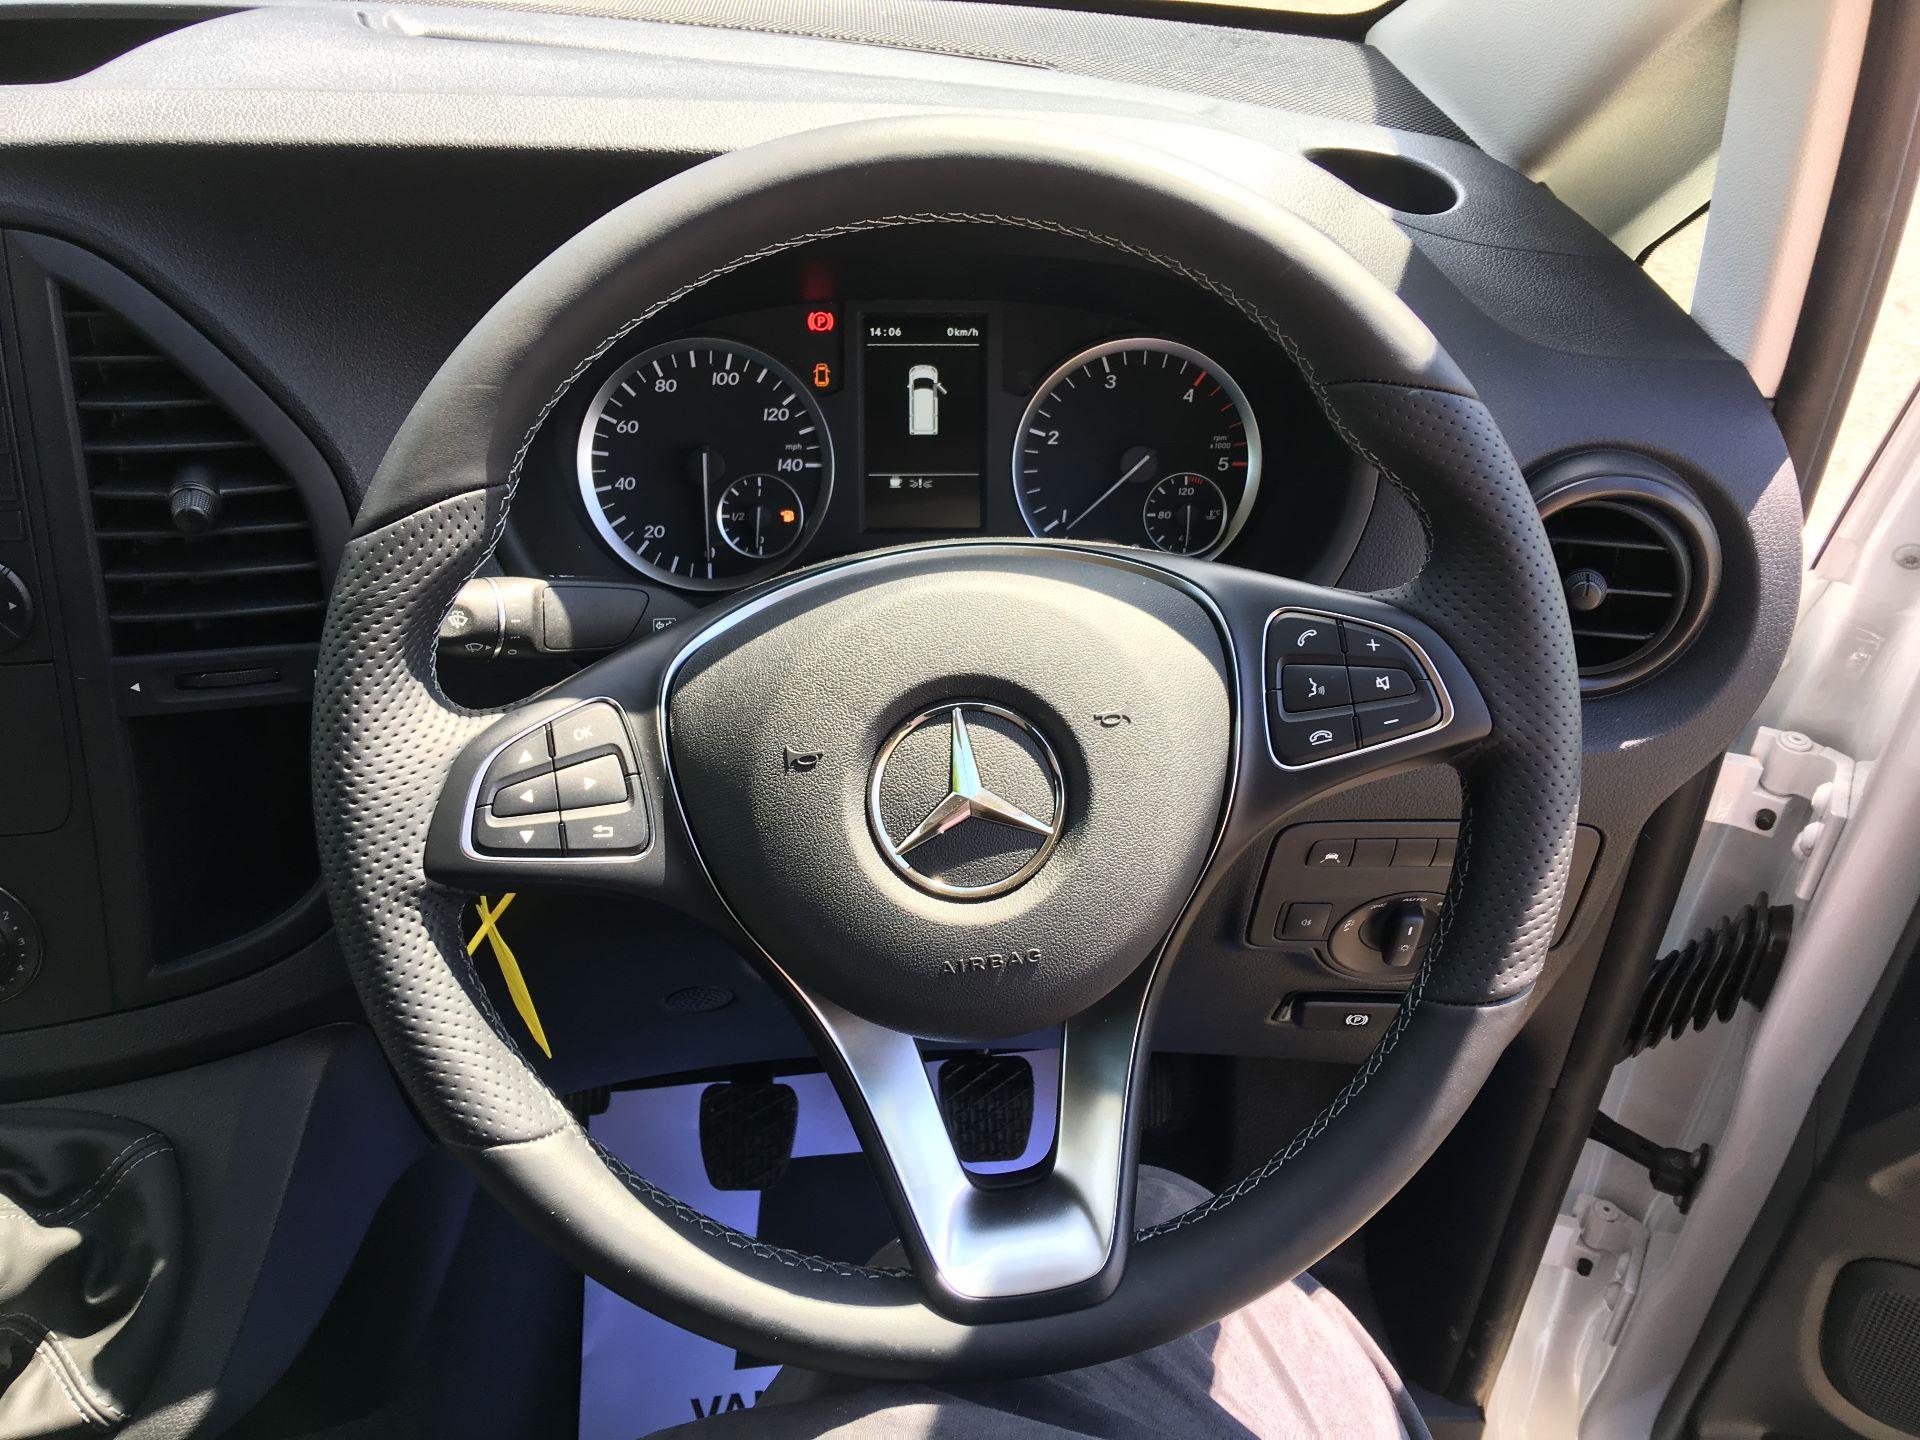 2019 Mercedes-Benz Vito LONG 111 CDI VAN EURO 5/6 (YM19HFY) Image 5